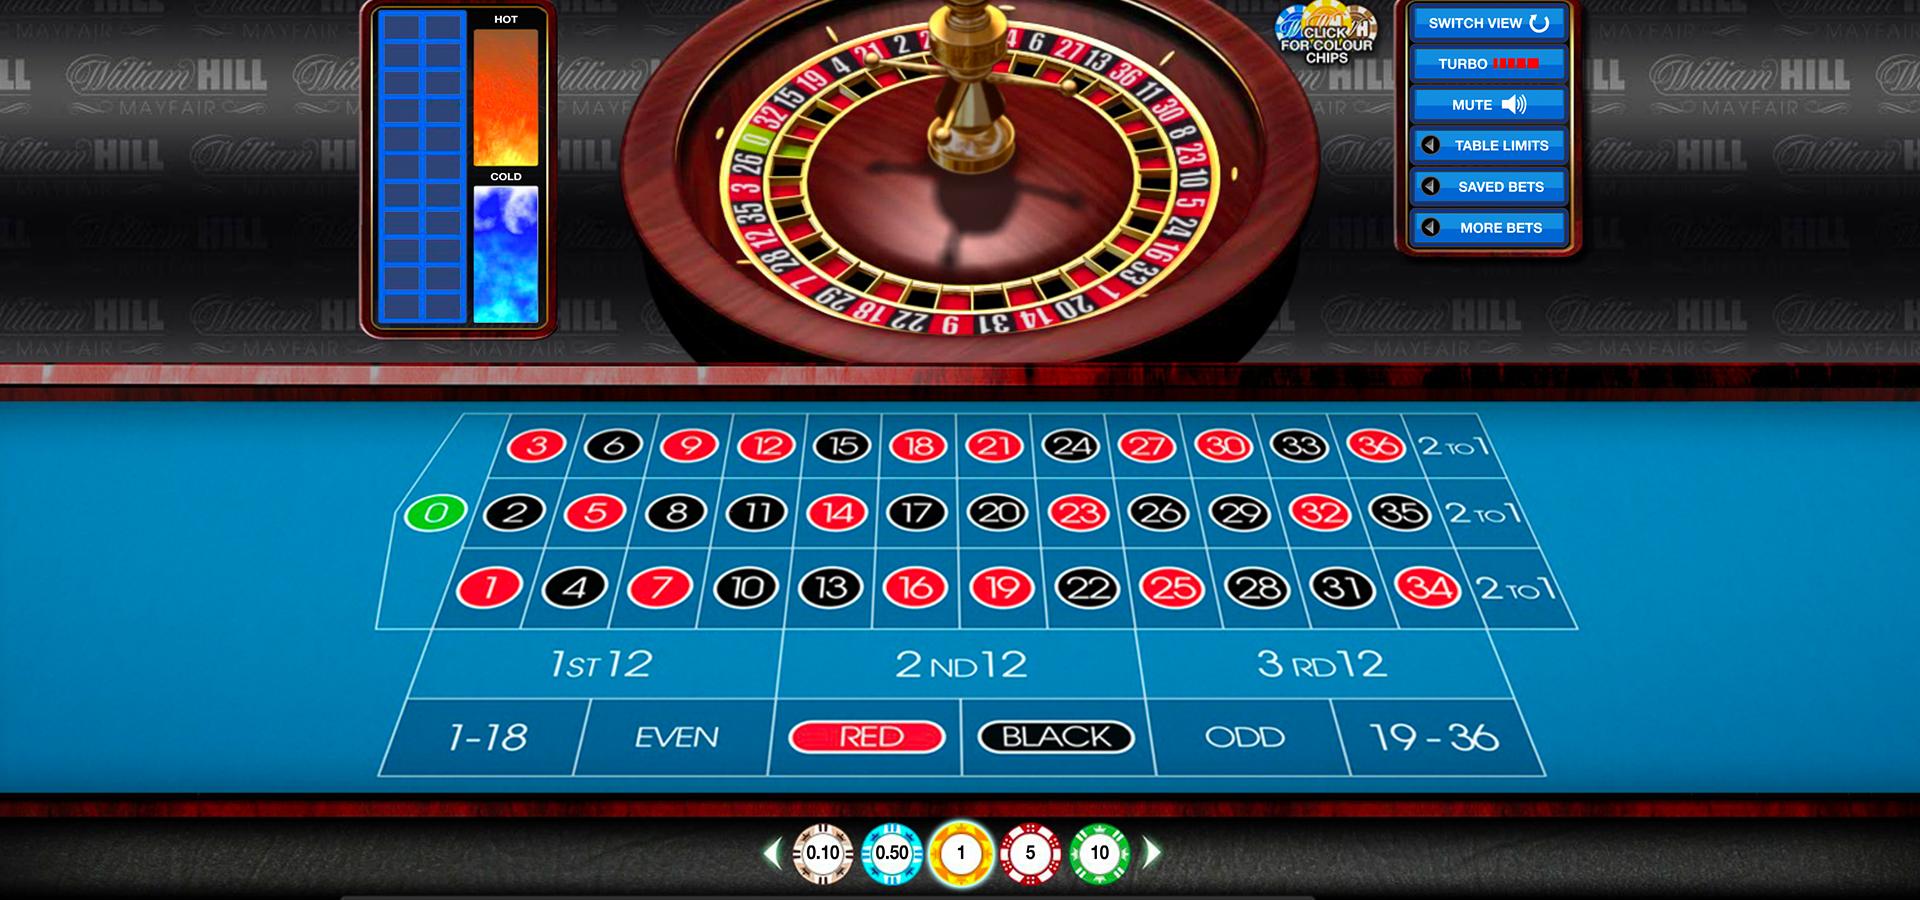 Patin a roulette schwinn